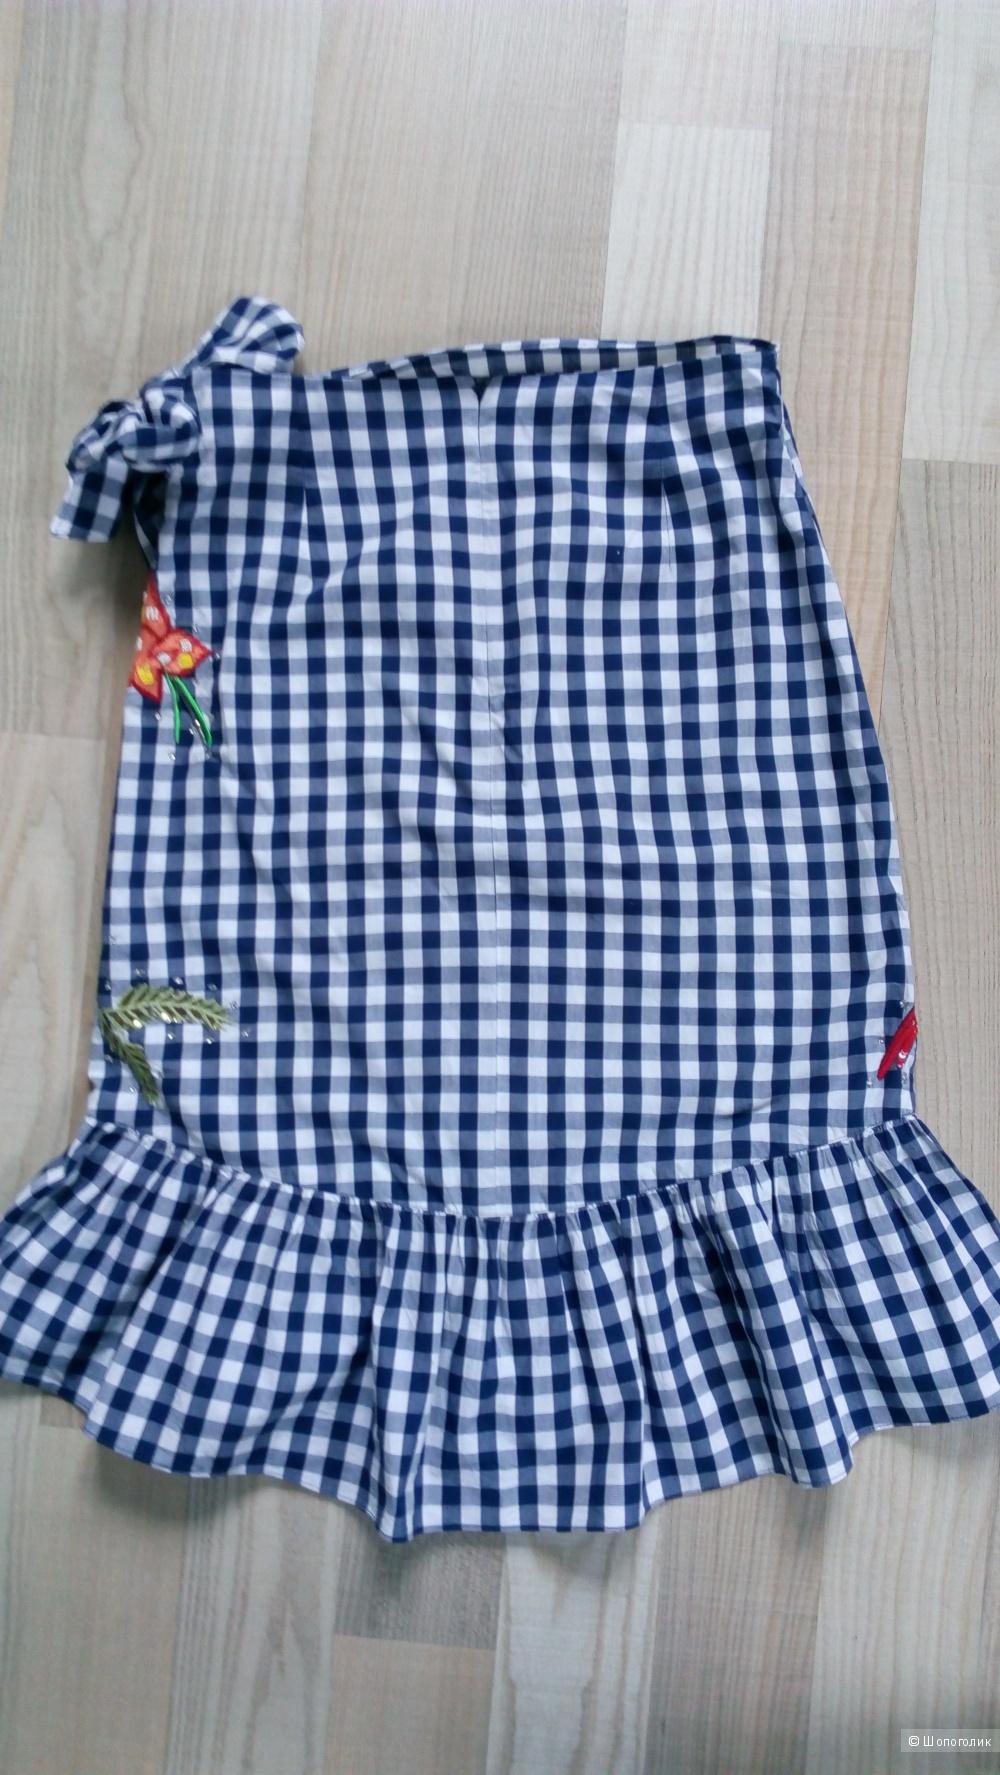 Комплект топ и юбка zara размер 42-44